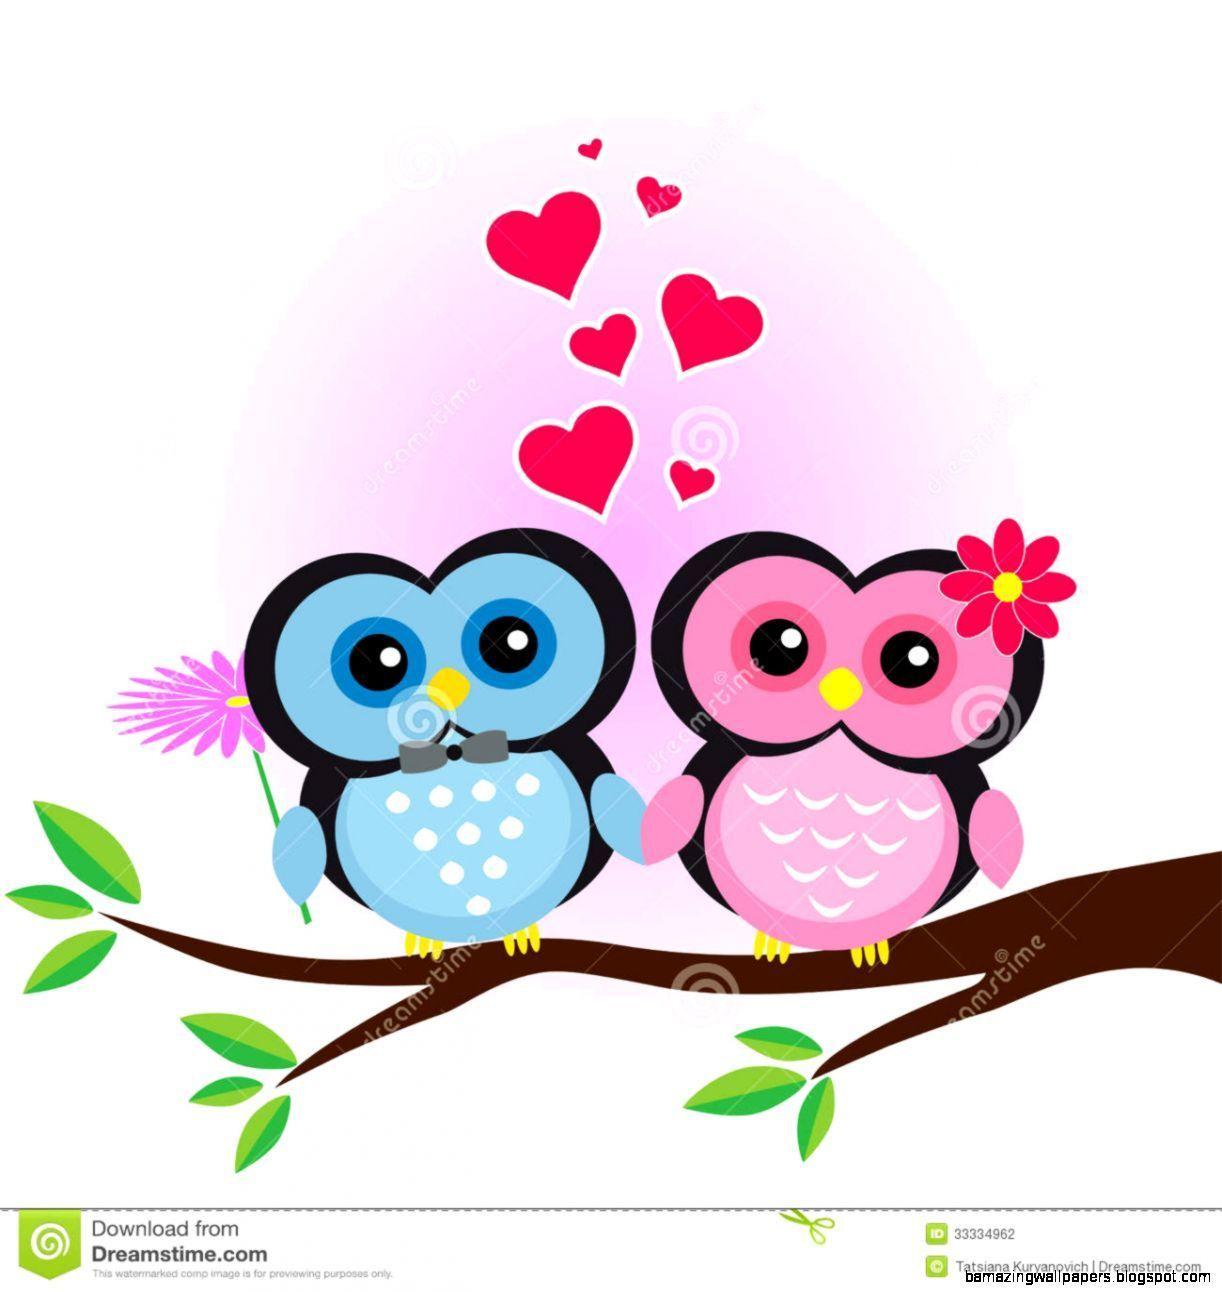 Love owls clipart 7 » Clipart Portal.